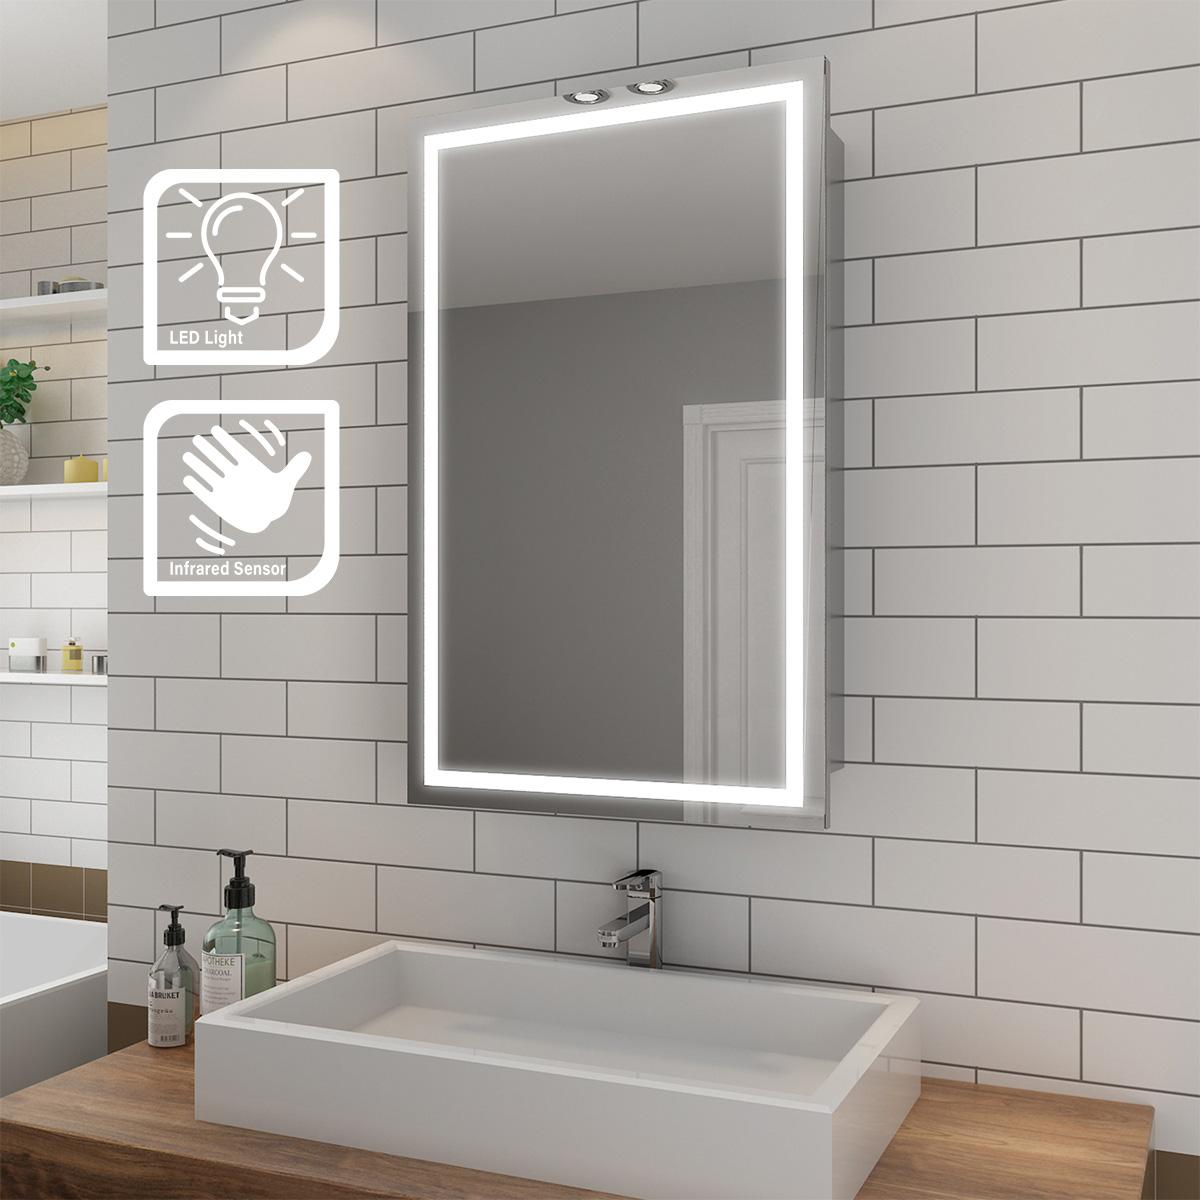 Sliding Door Led Light Up Bathroom Mirror Cabinet Shelf Wall Hanging Sensor 692456166531 Ebay